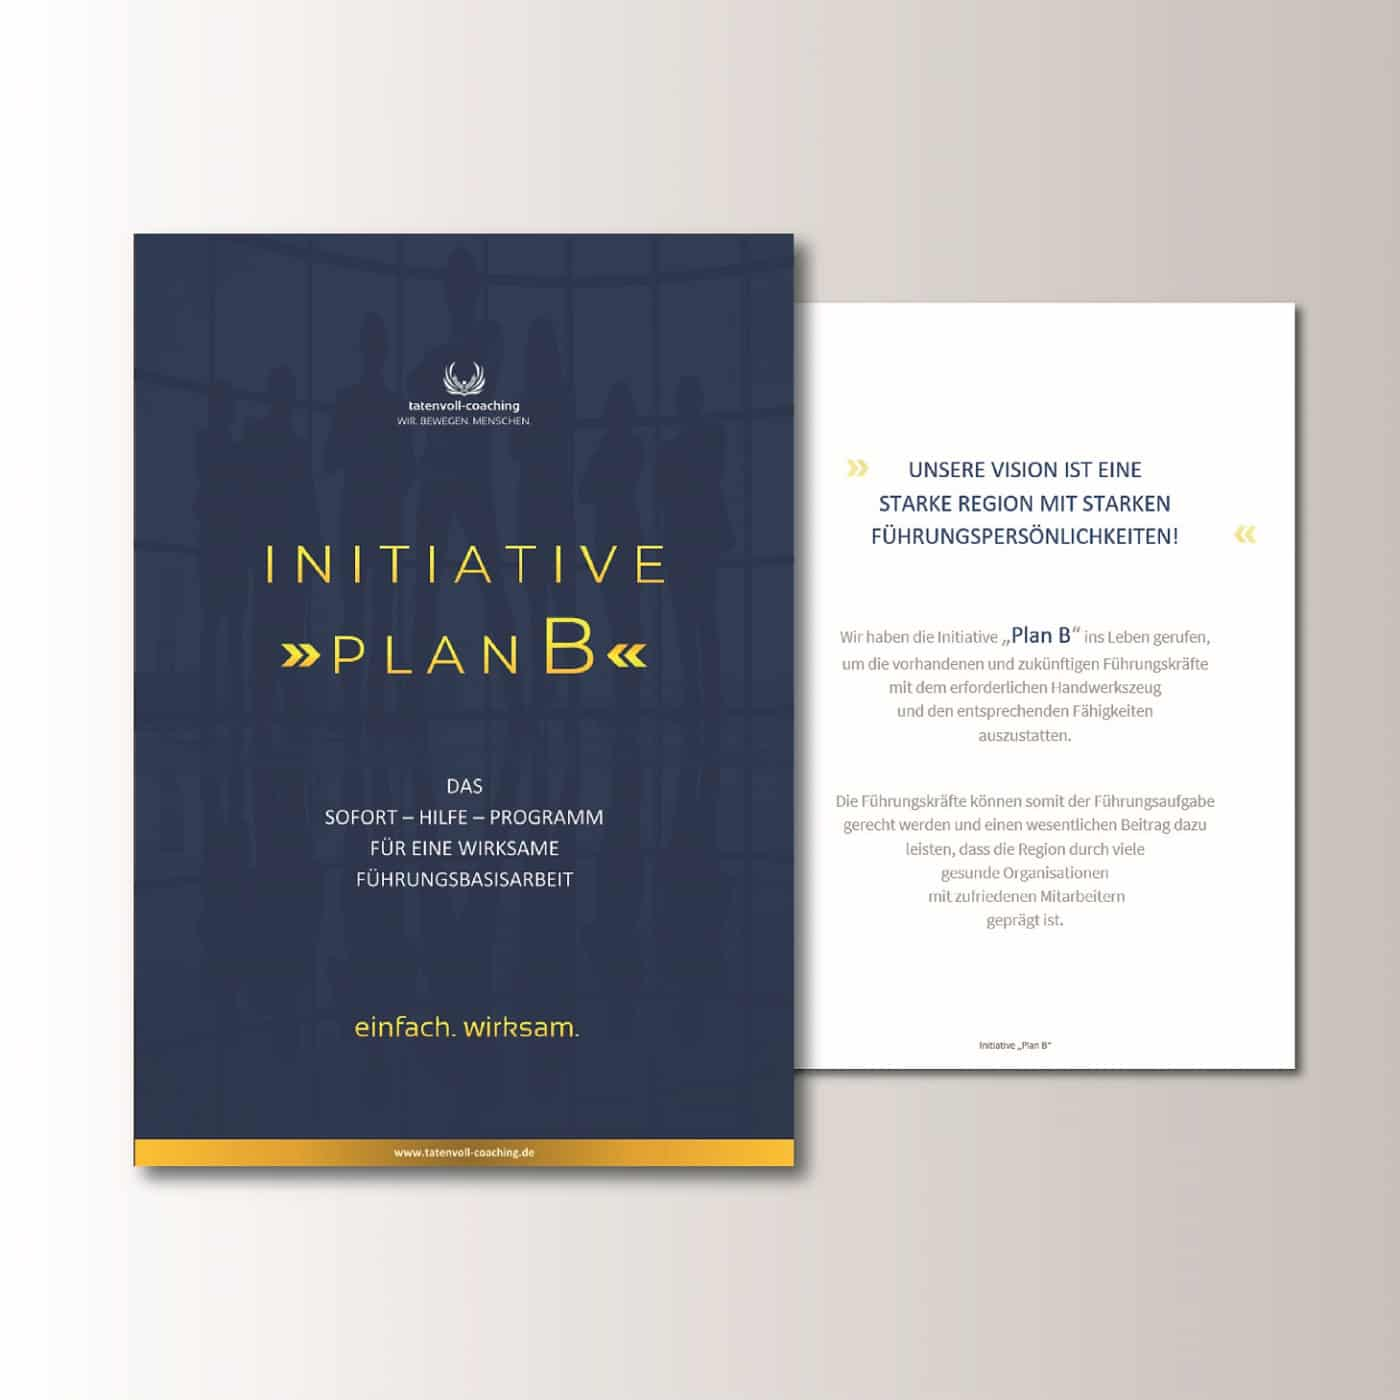 Initiative Plan B Tatenvoll - Coaching